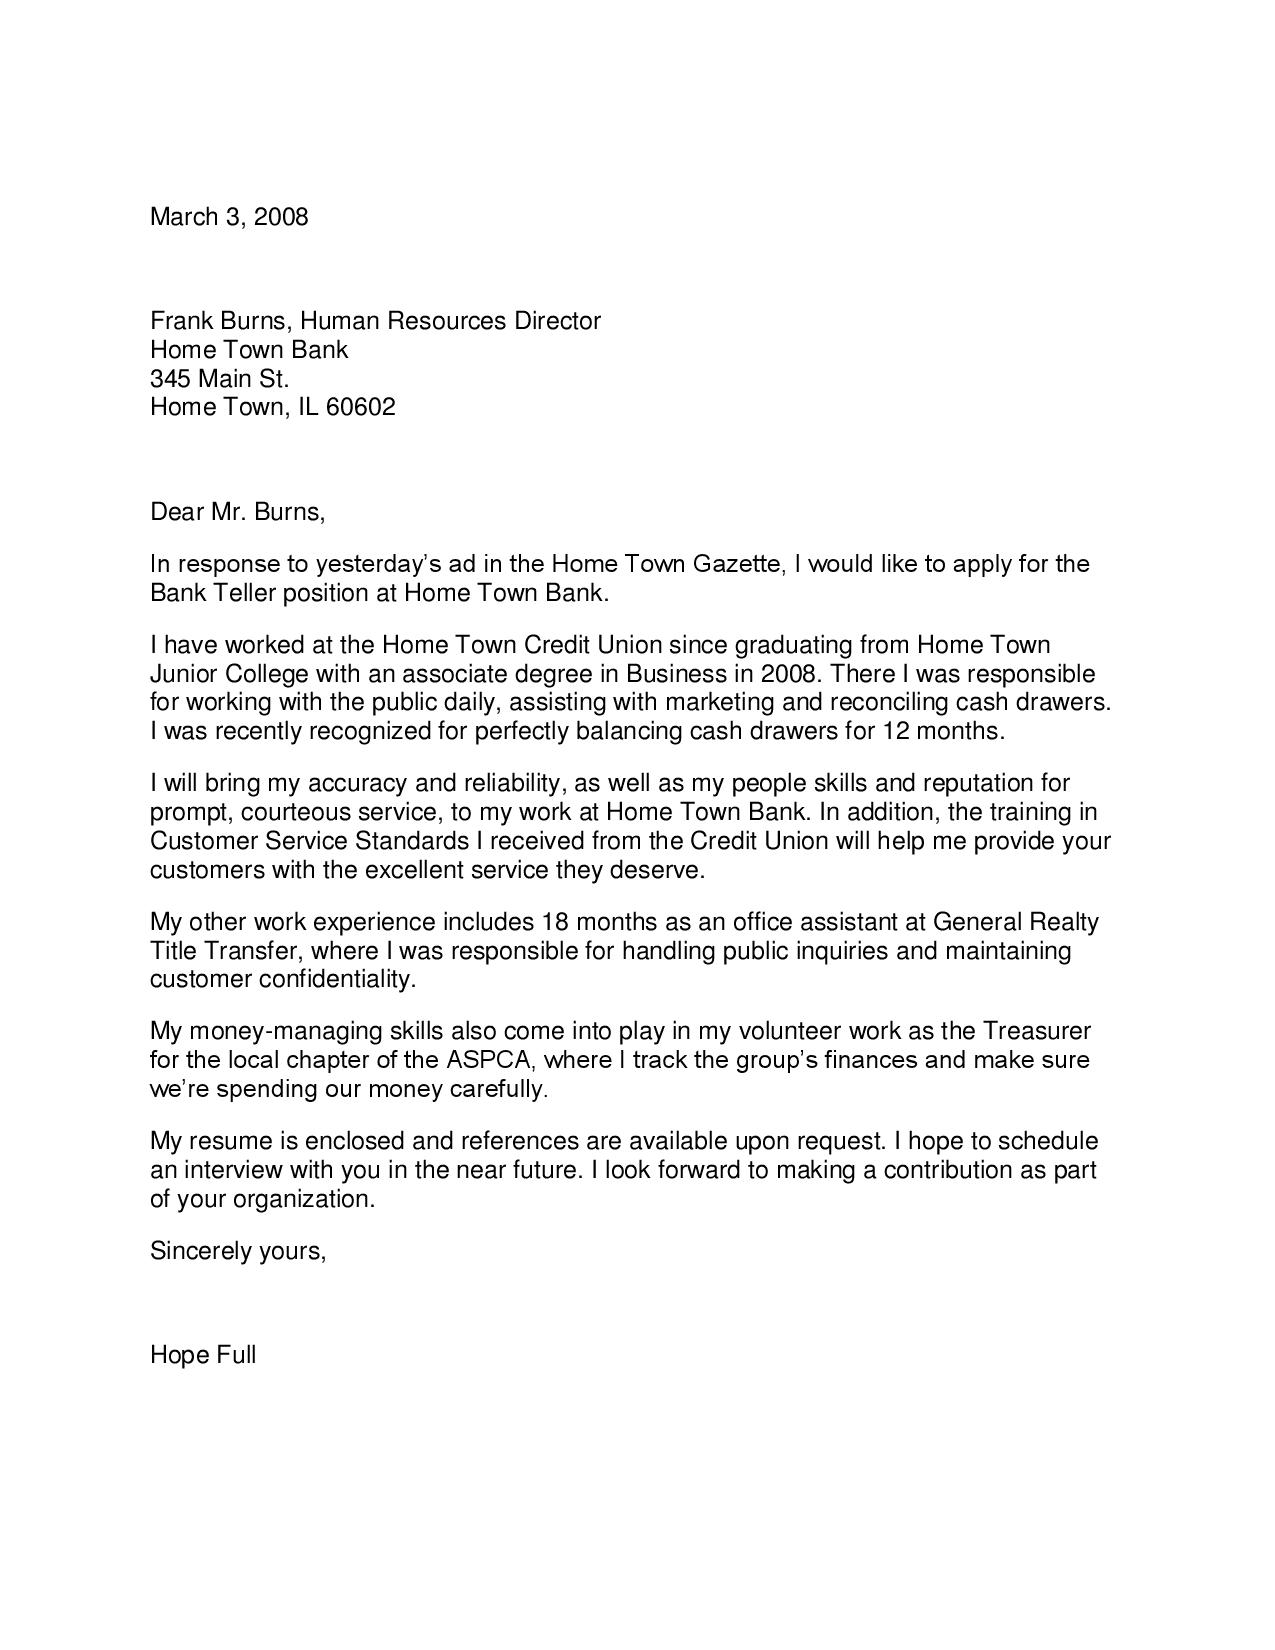 Animal Care Manager Cover Letter Packaging Designer Cover Letter